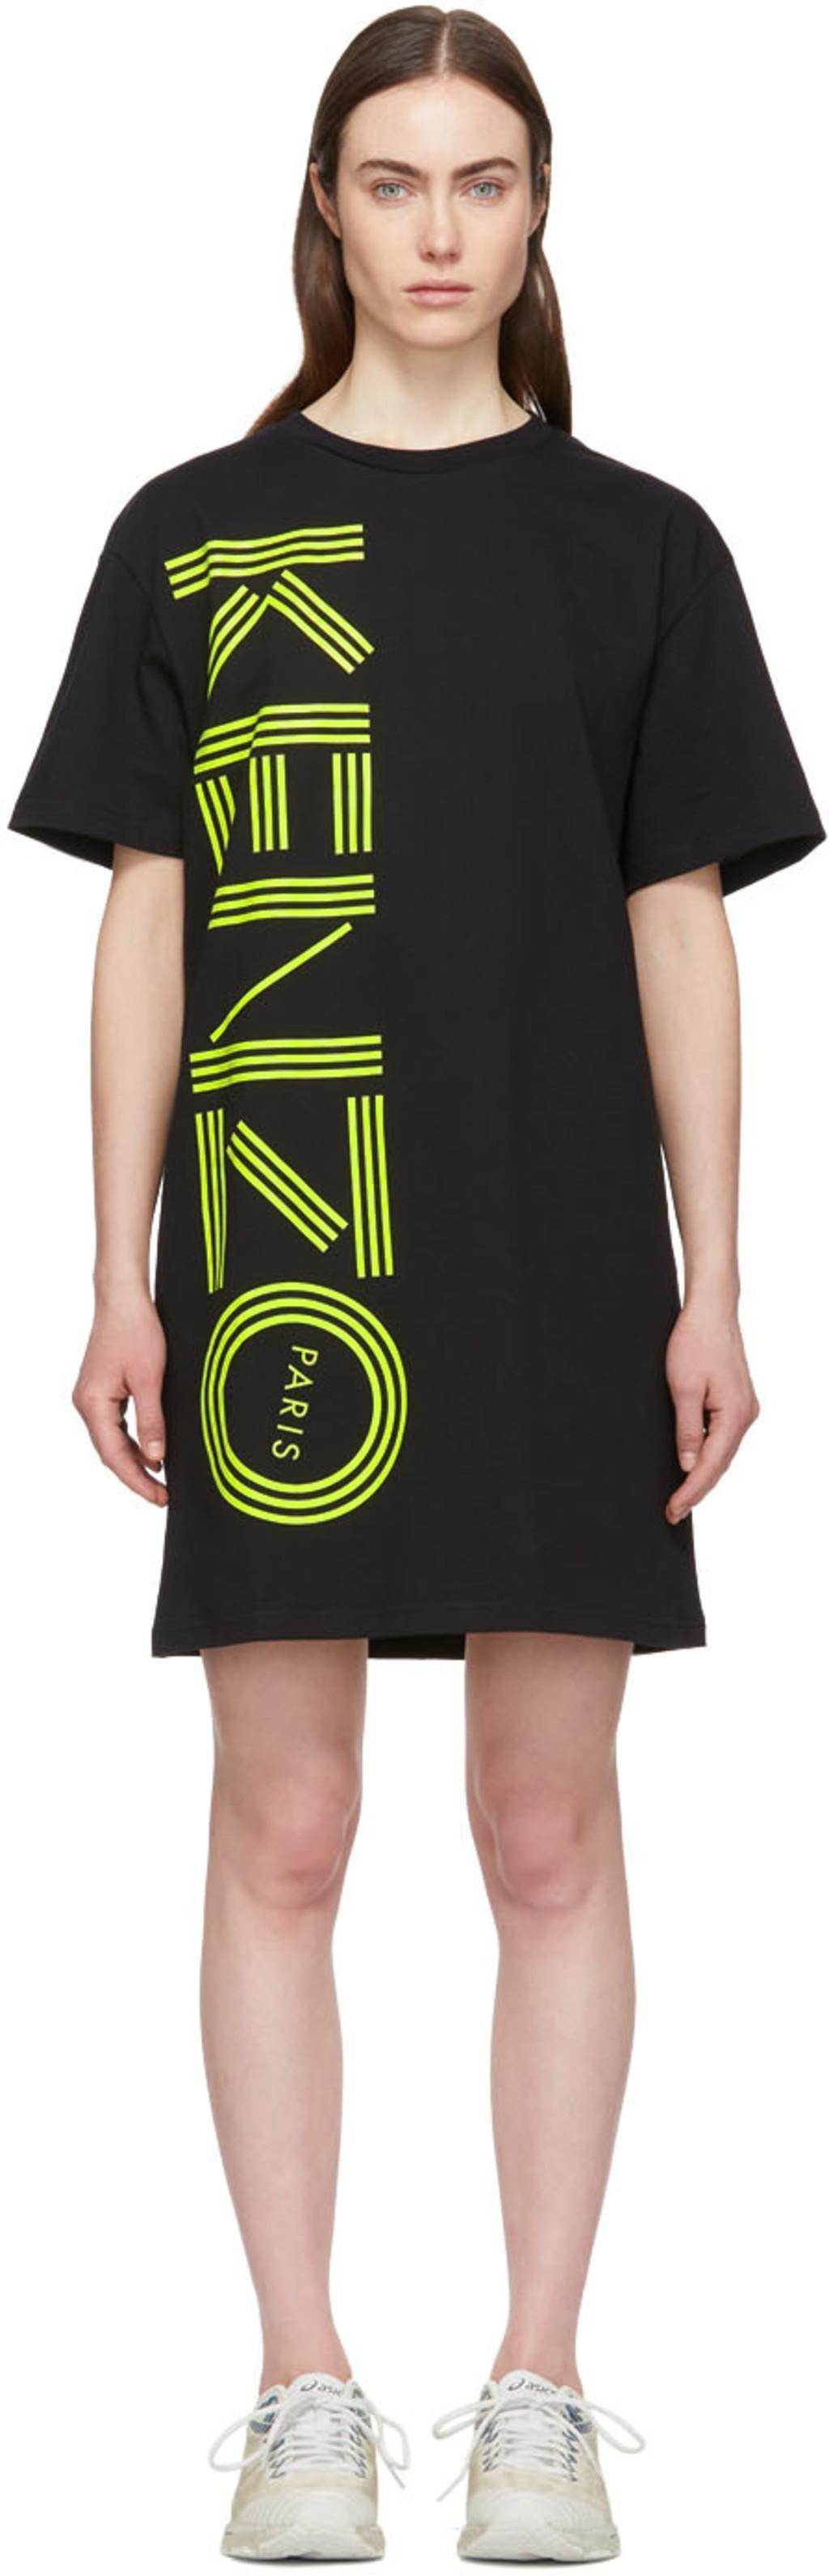 a90785e87f86 Kenzo for Women SS19 Collection   SSENSE